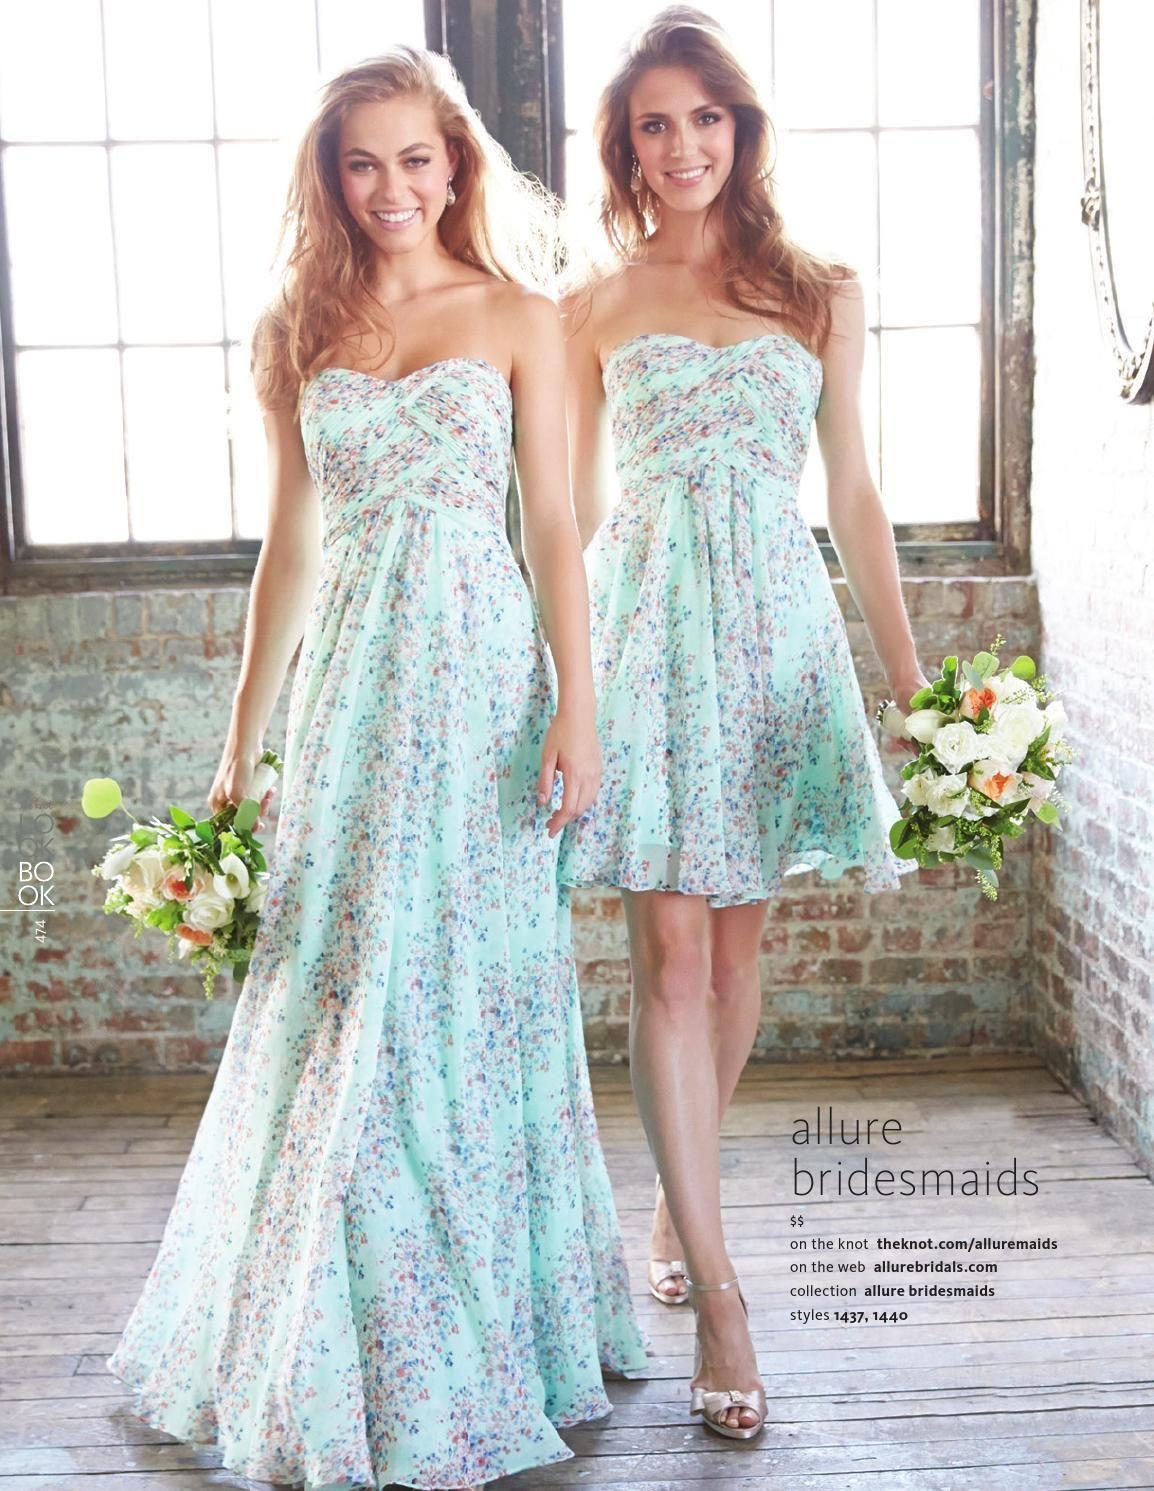 The Knot Winter 2014 | Aqua bridesmaids, Beach bridesmaids and Wedding